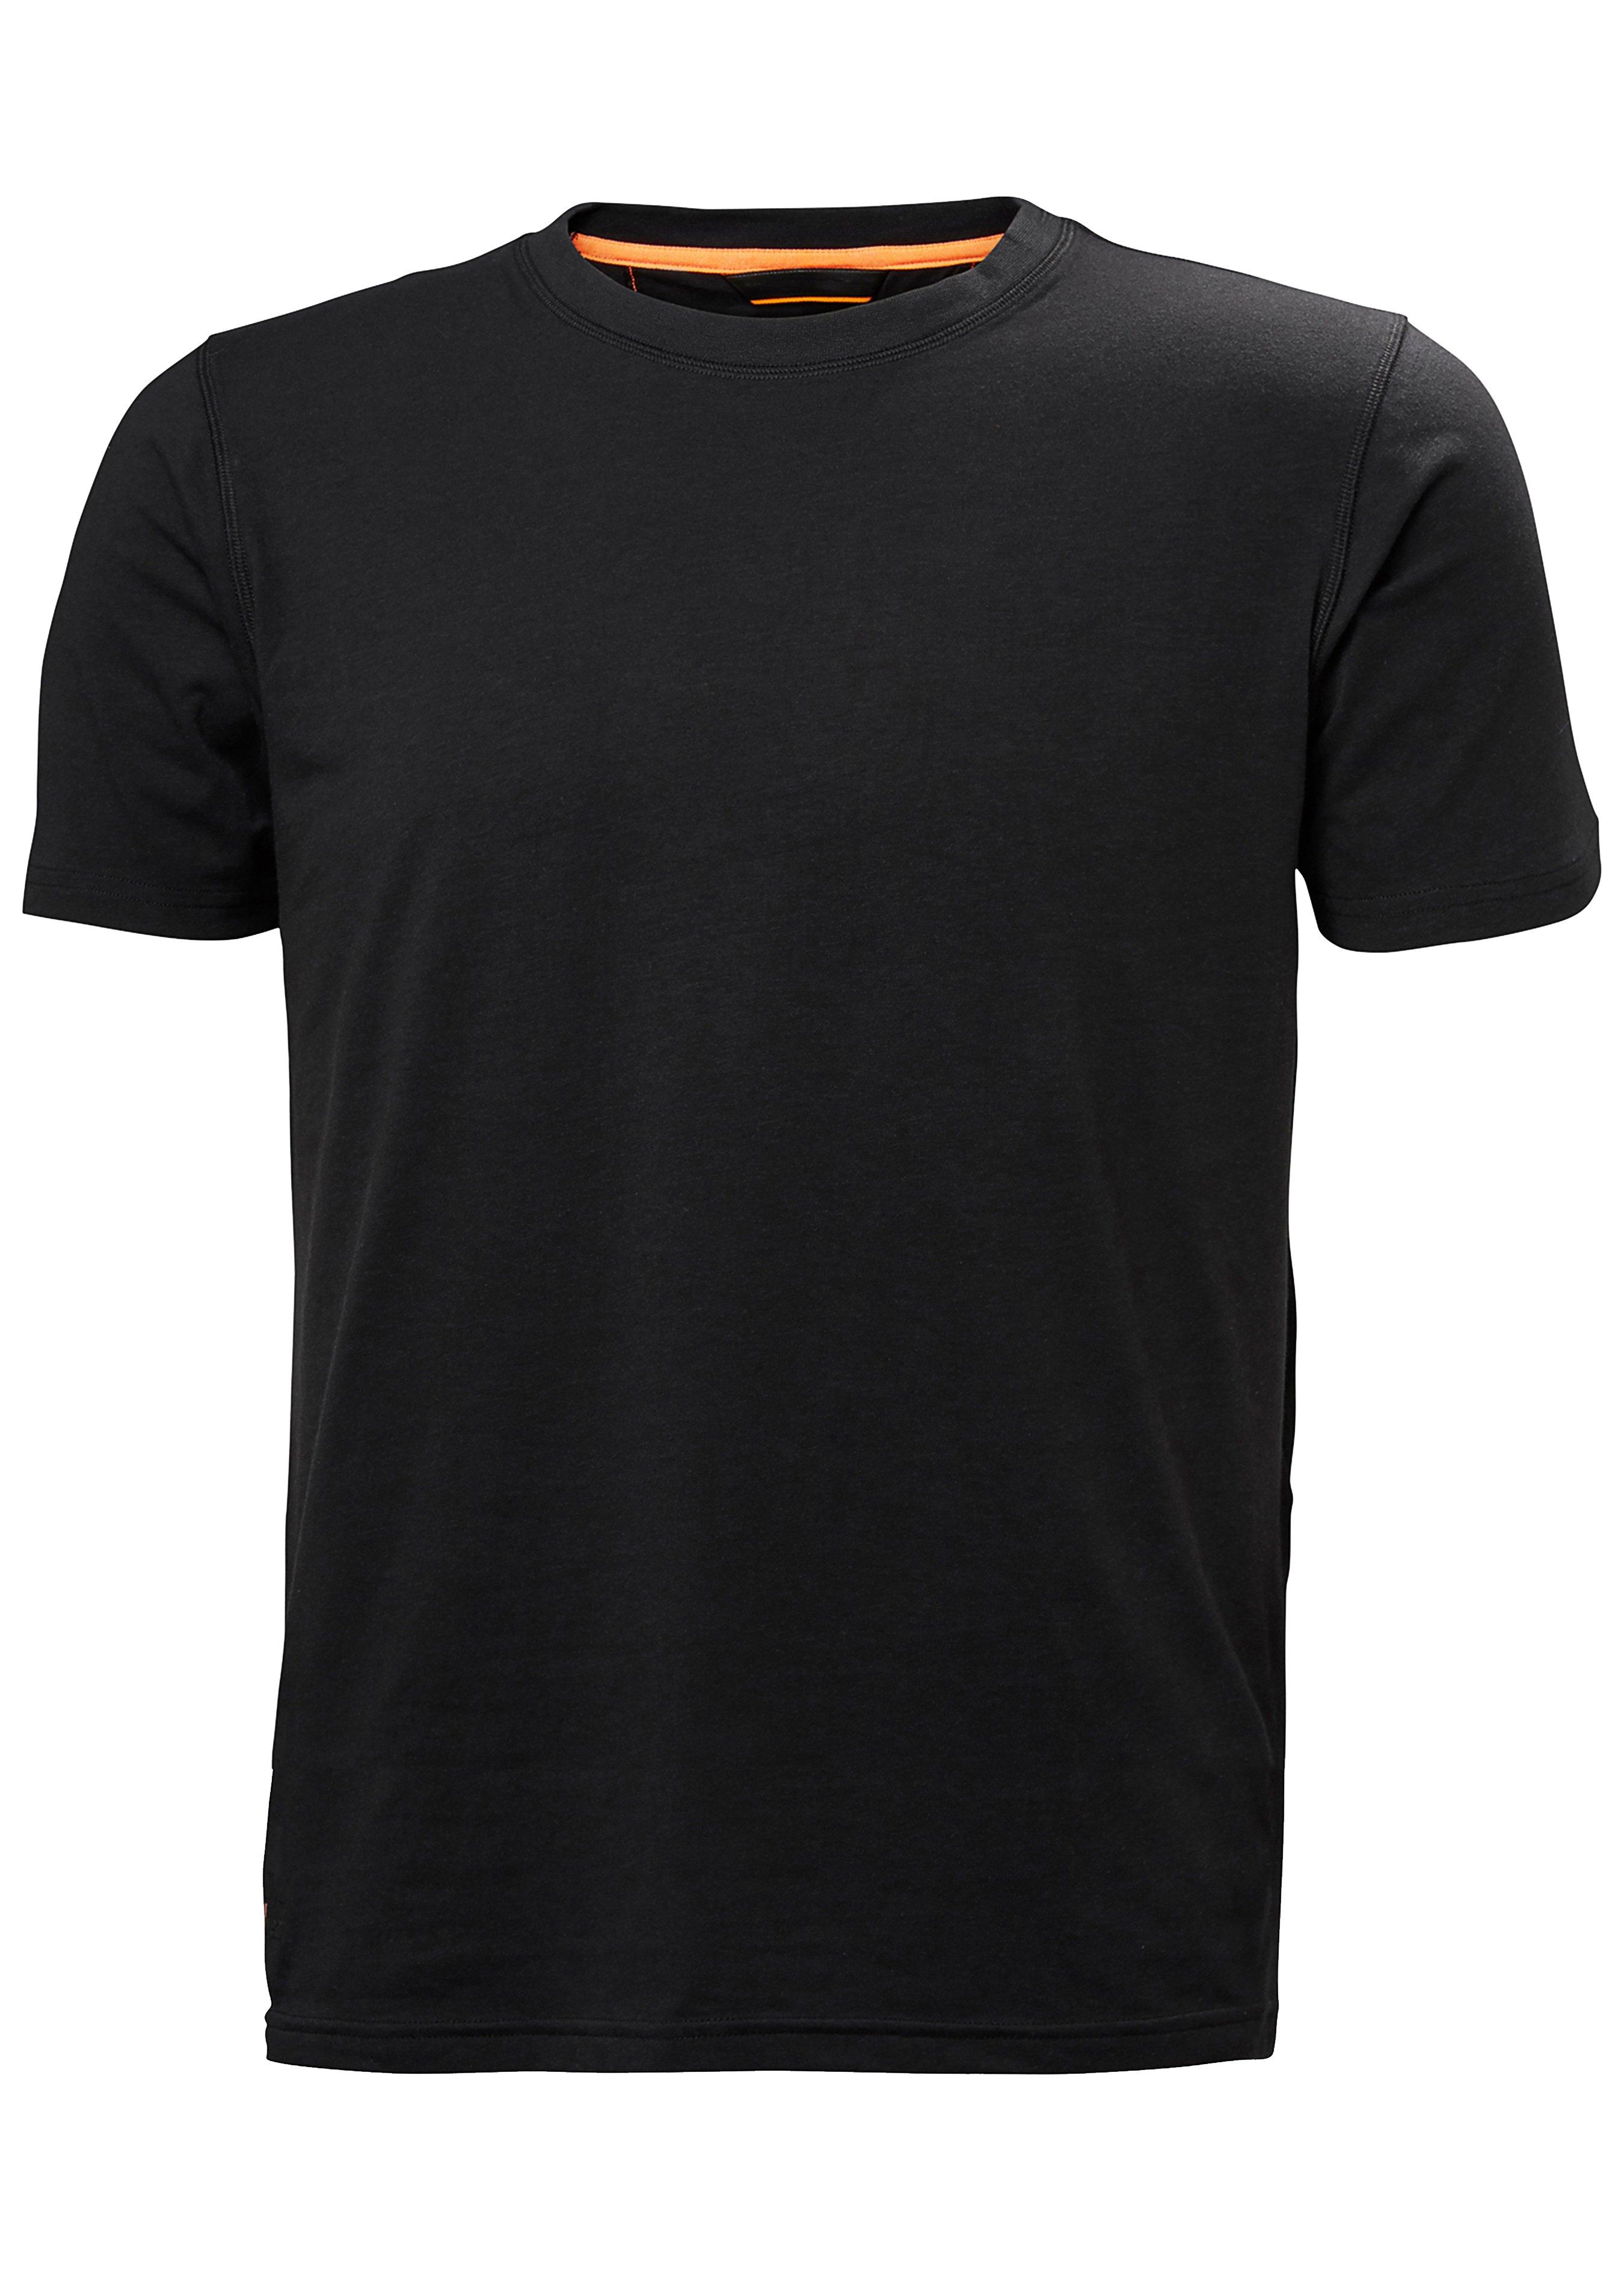 Helly Hansen T-Shirt Chelsea 281010L 1